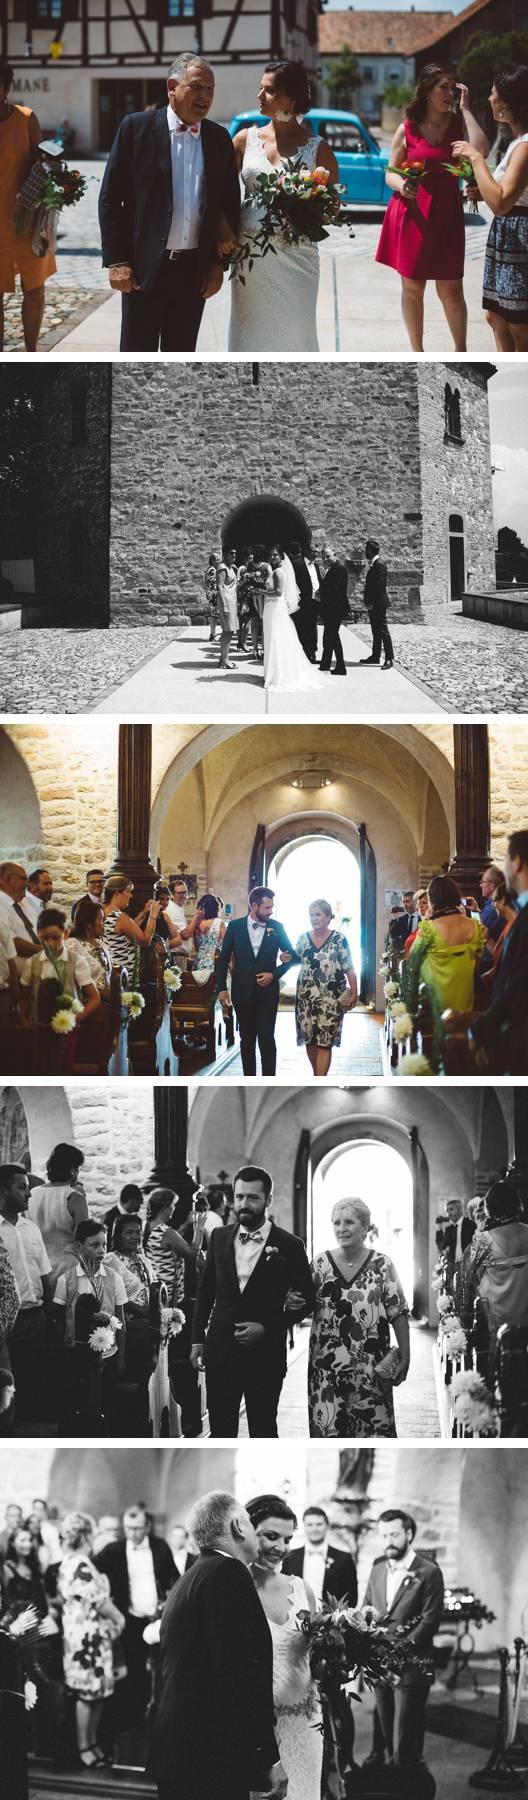 mariage-tropical-raben-horben_0008.jpg